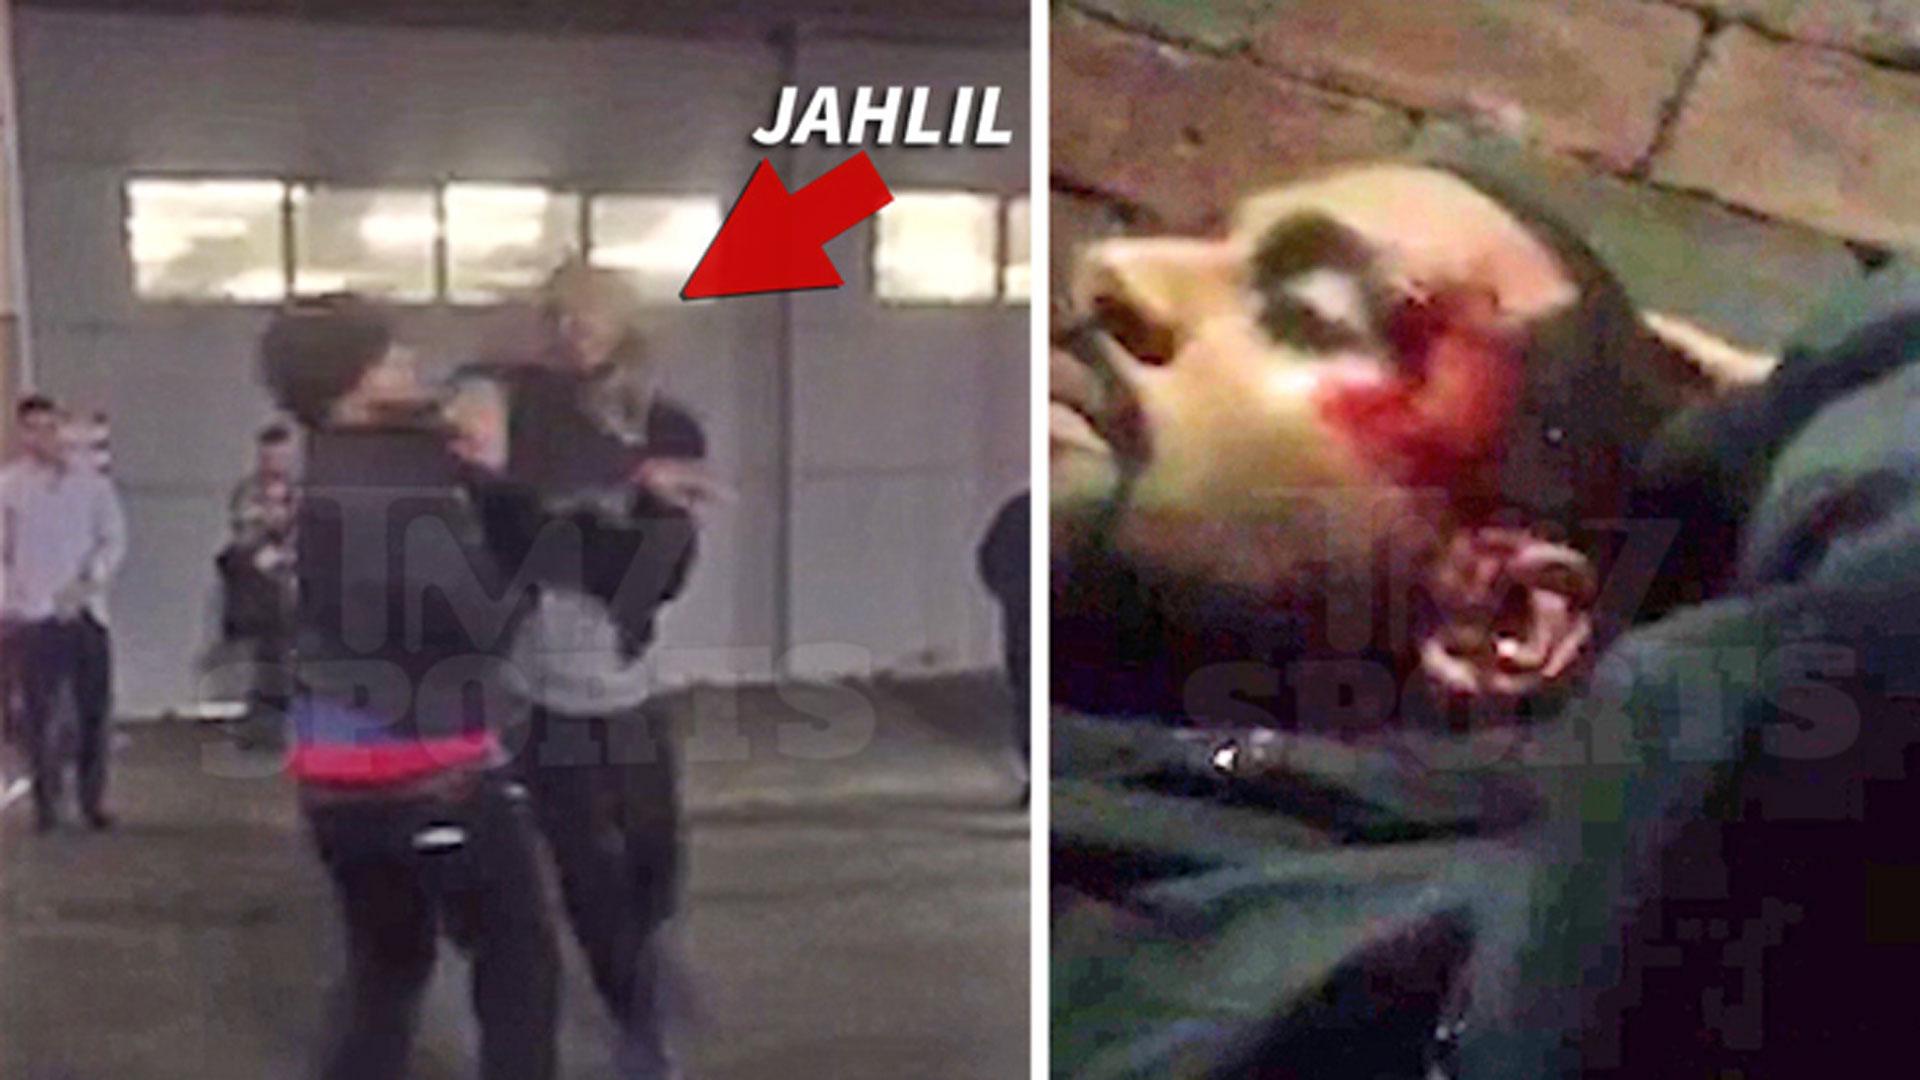 Jahlil-okafor-fight-120215-tmz-ftr